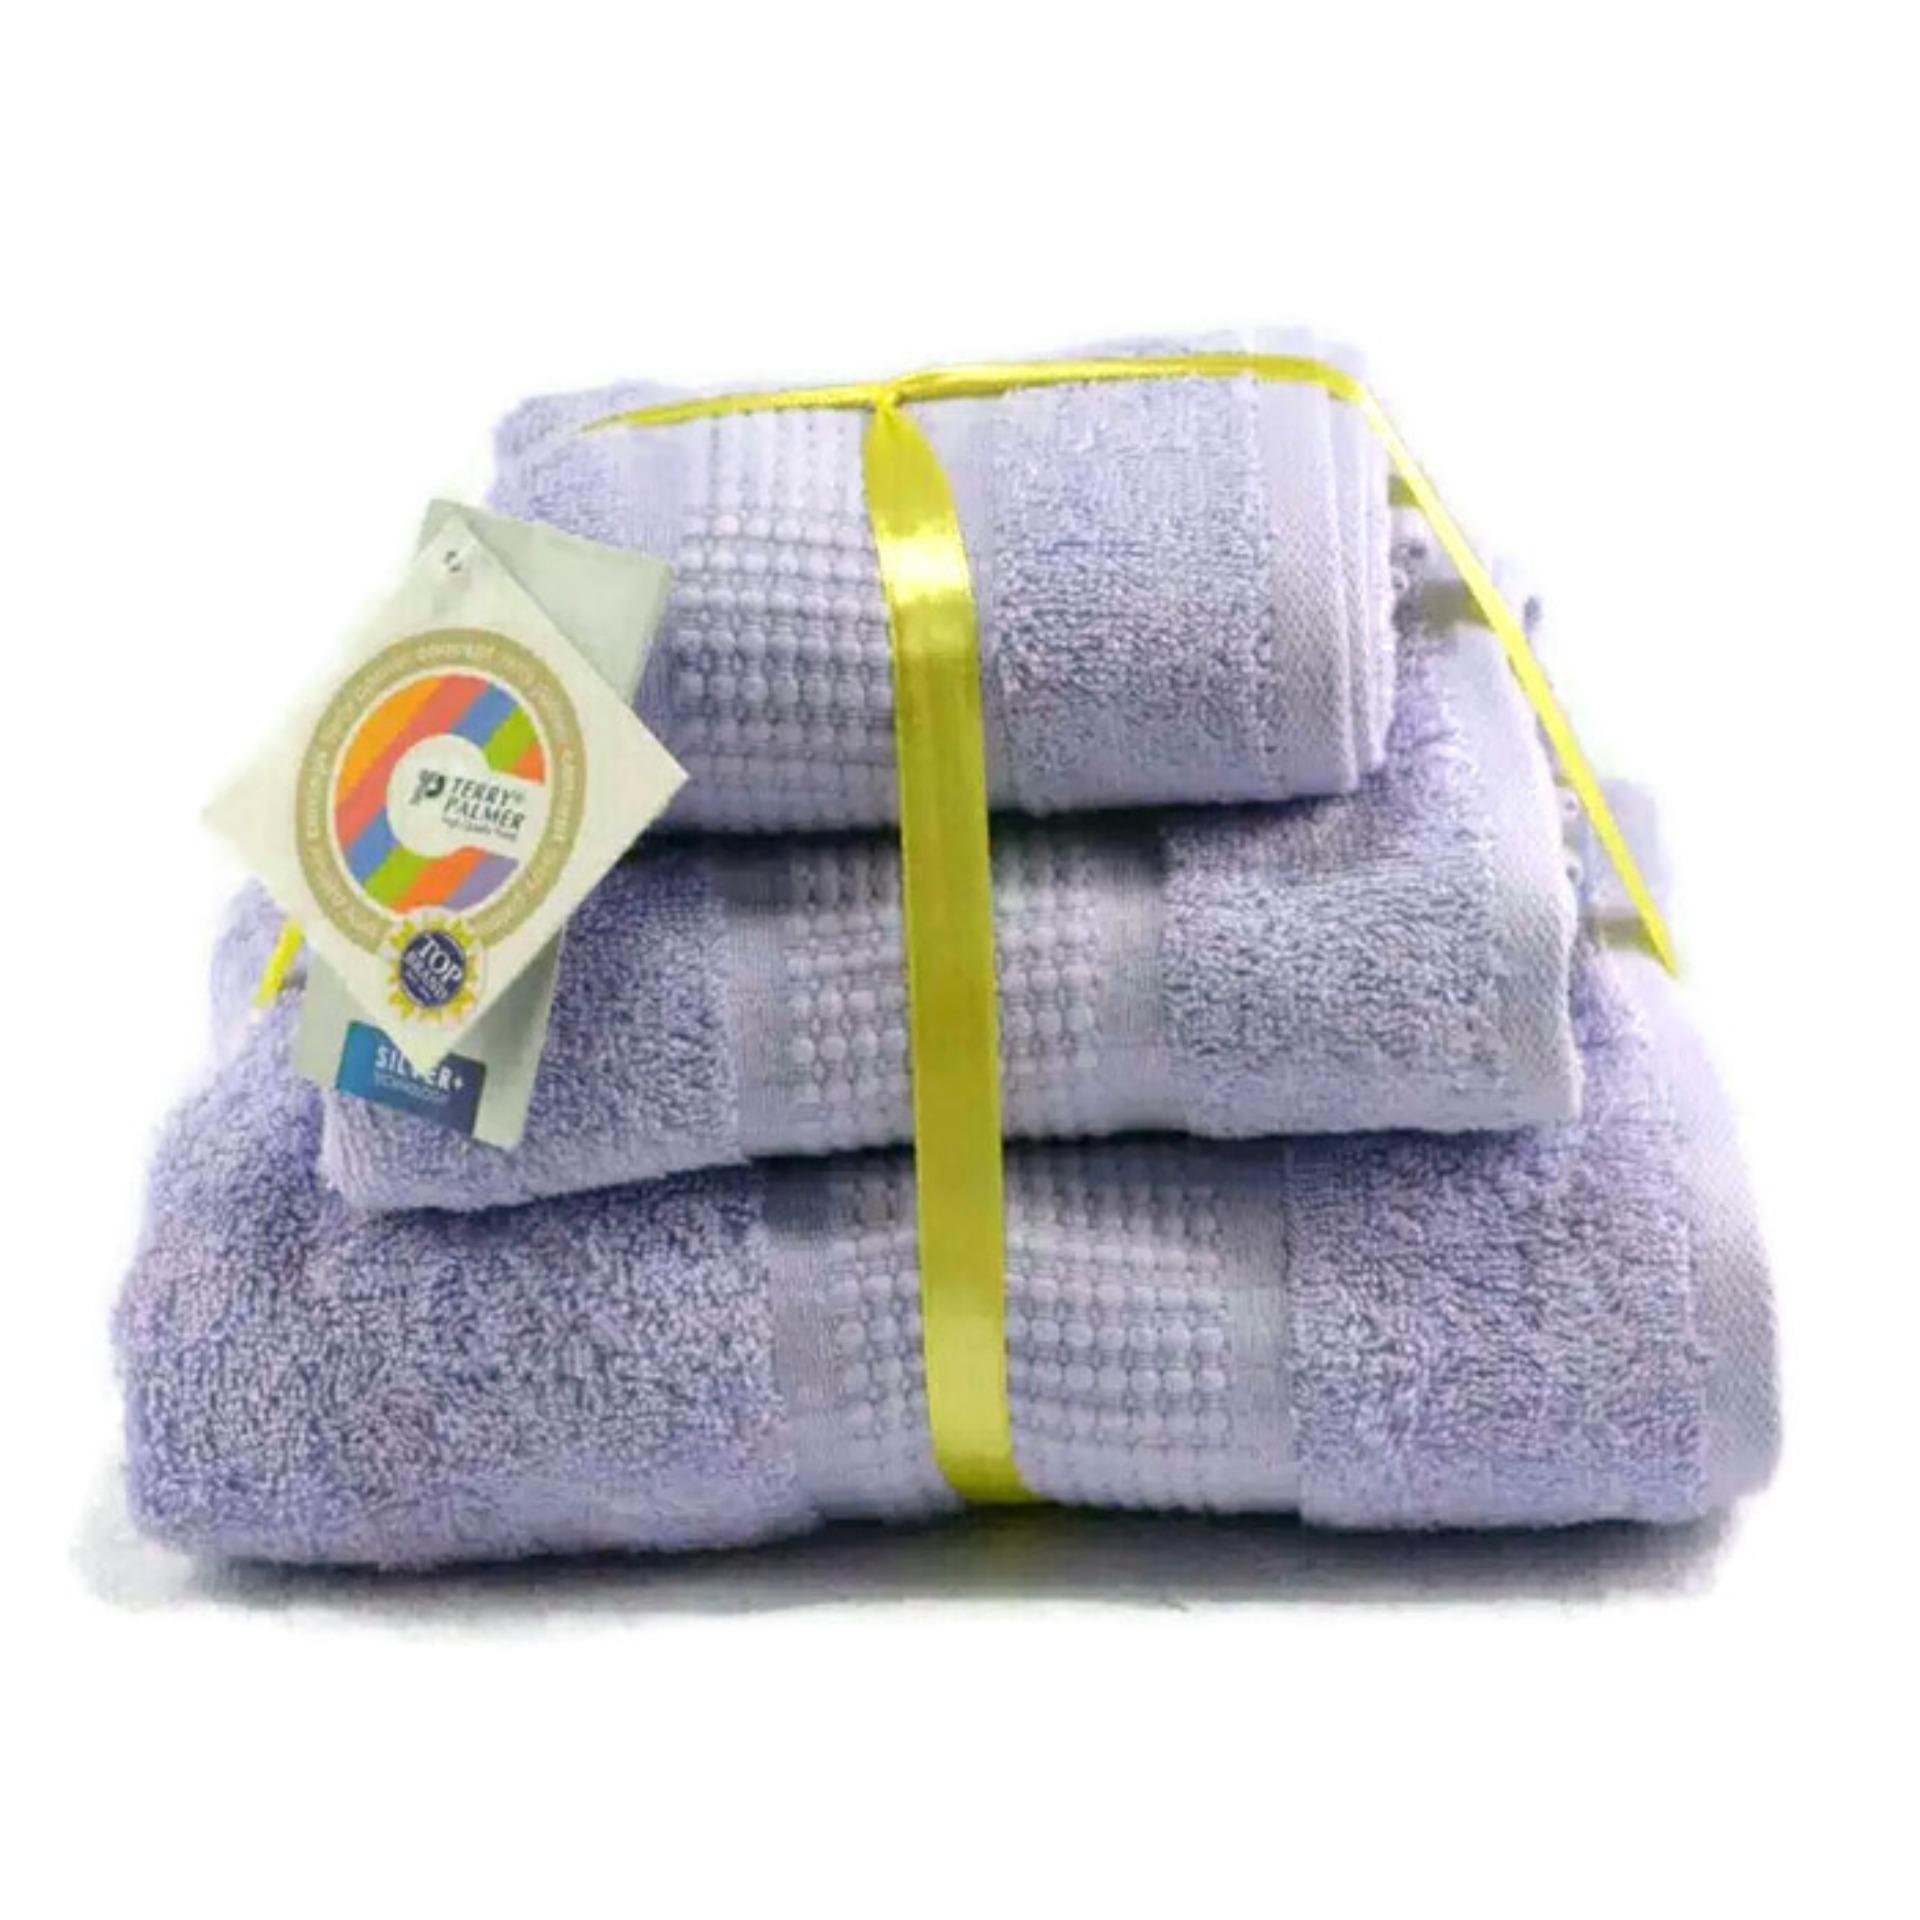 Handuk Mandi Terry Palmer Terbaru Exclusiv Combed Cotton Anti Bacterial Isi 3pcs